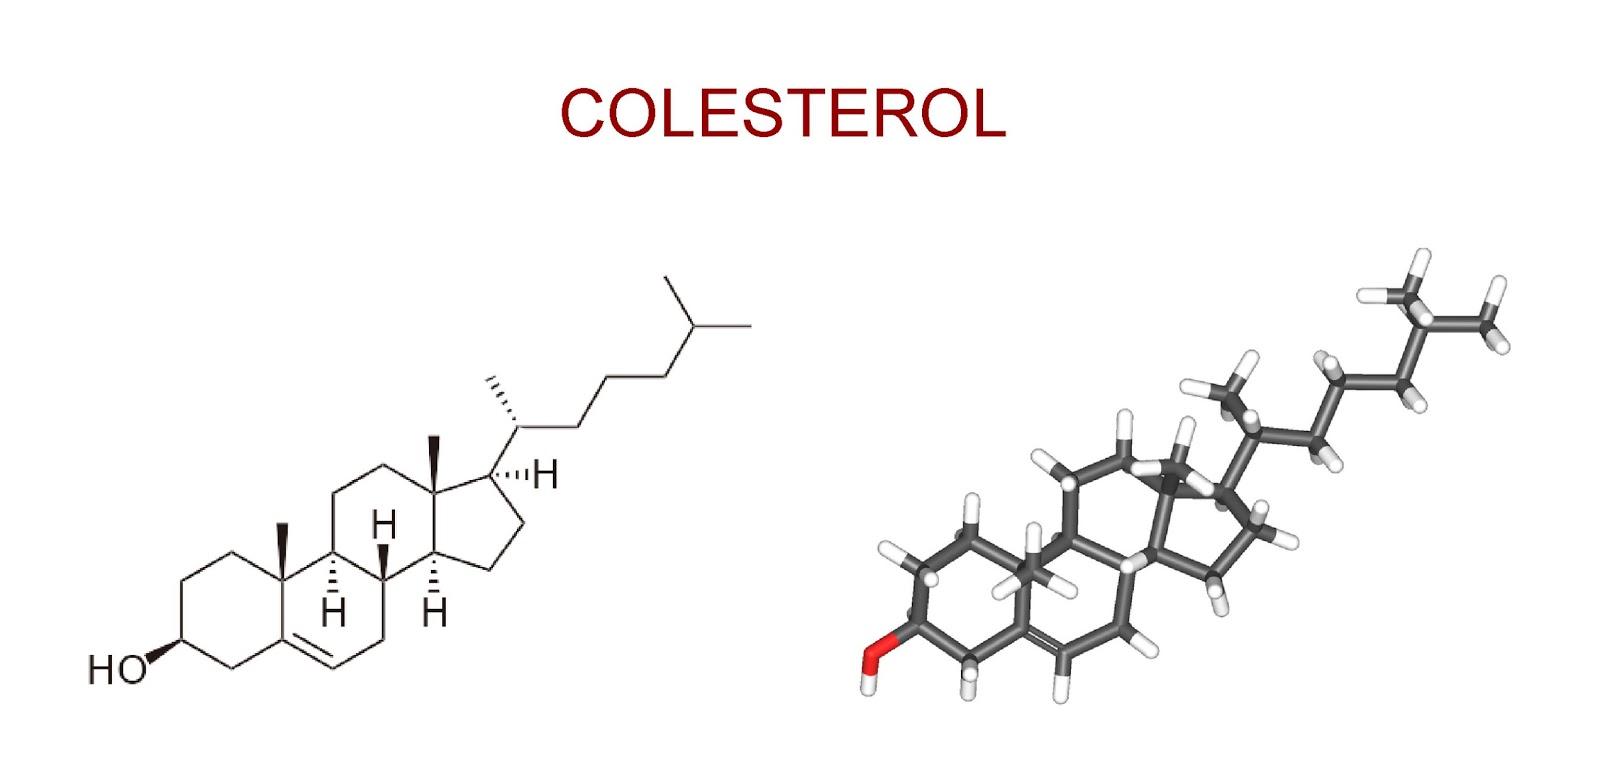 Estructura química de la molécula de colesterol